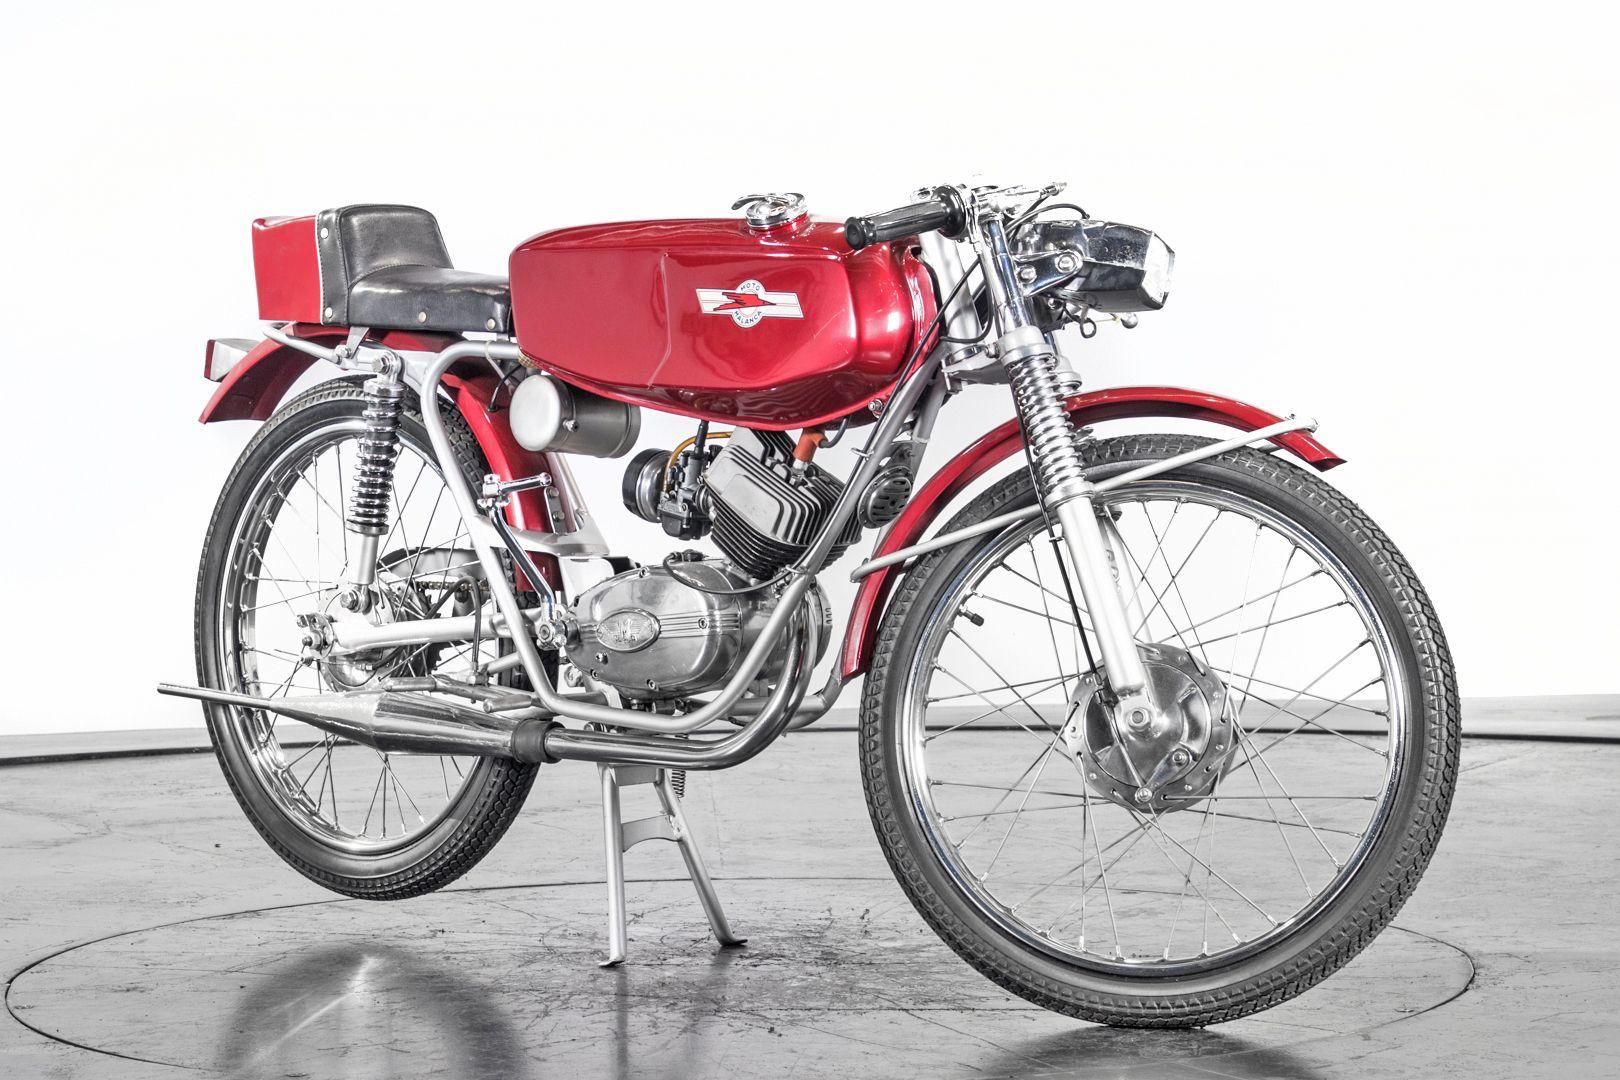 1963 Malanca Nicky 50 41152